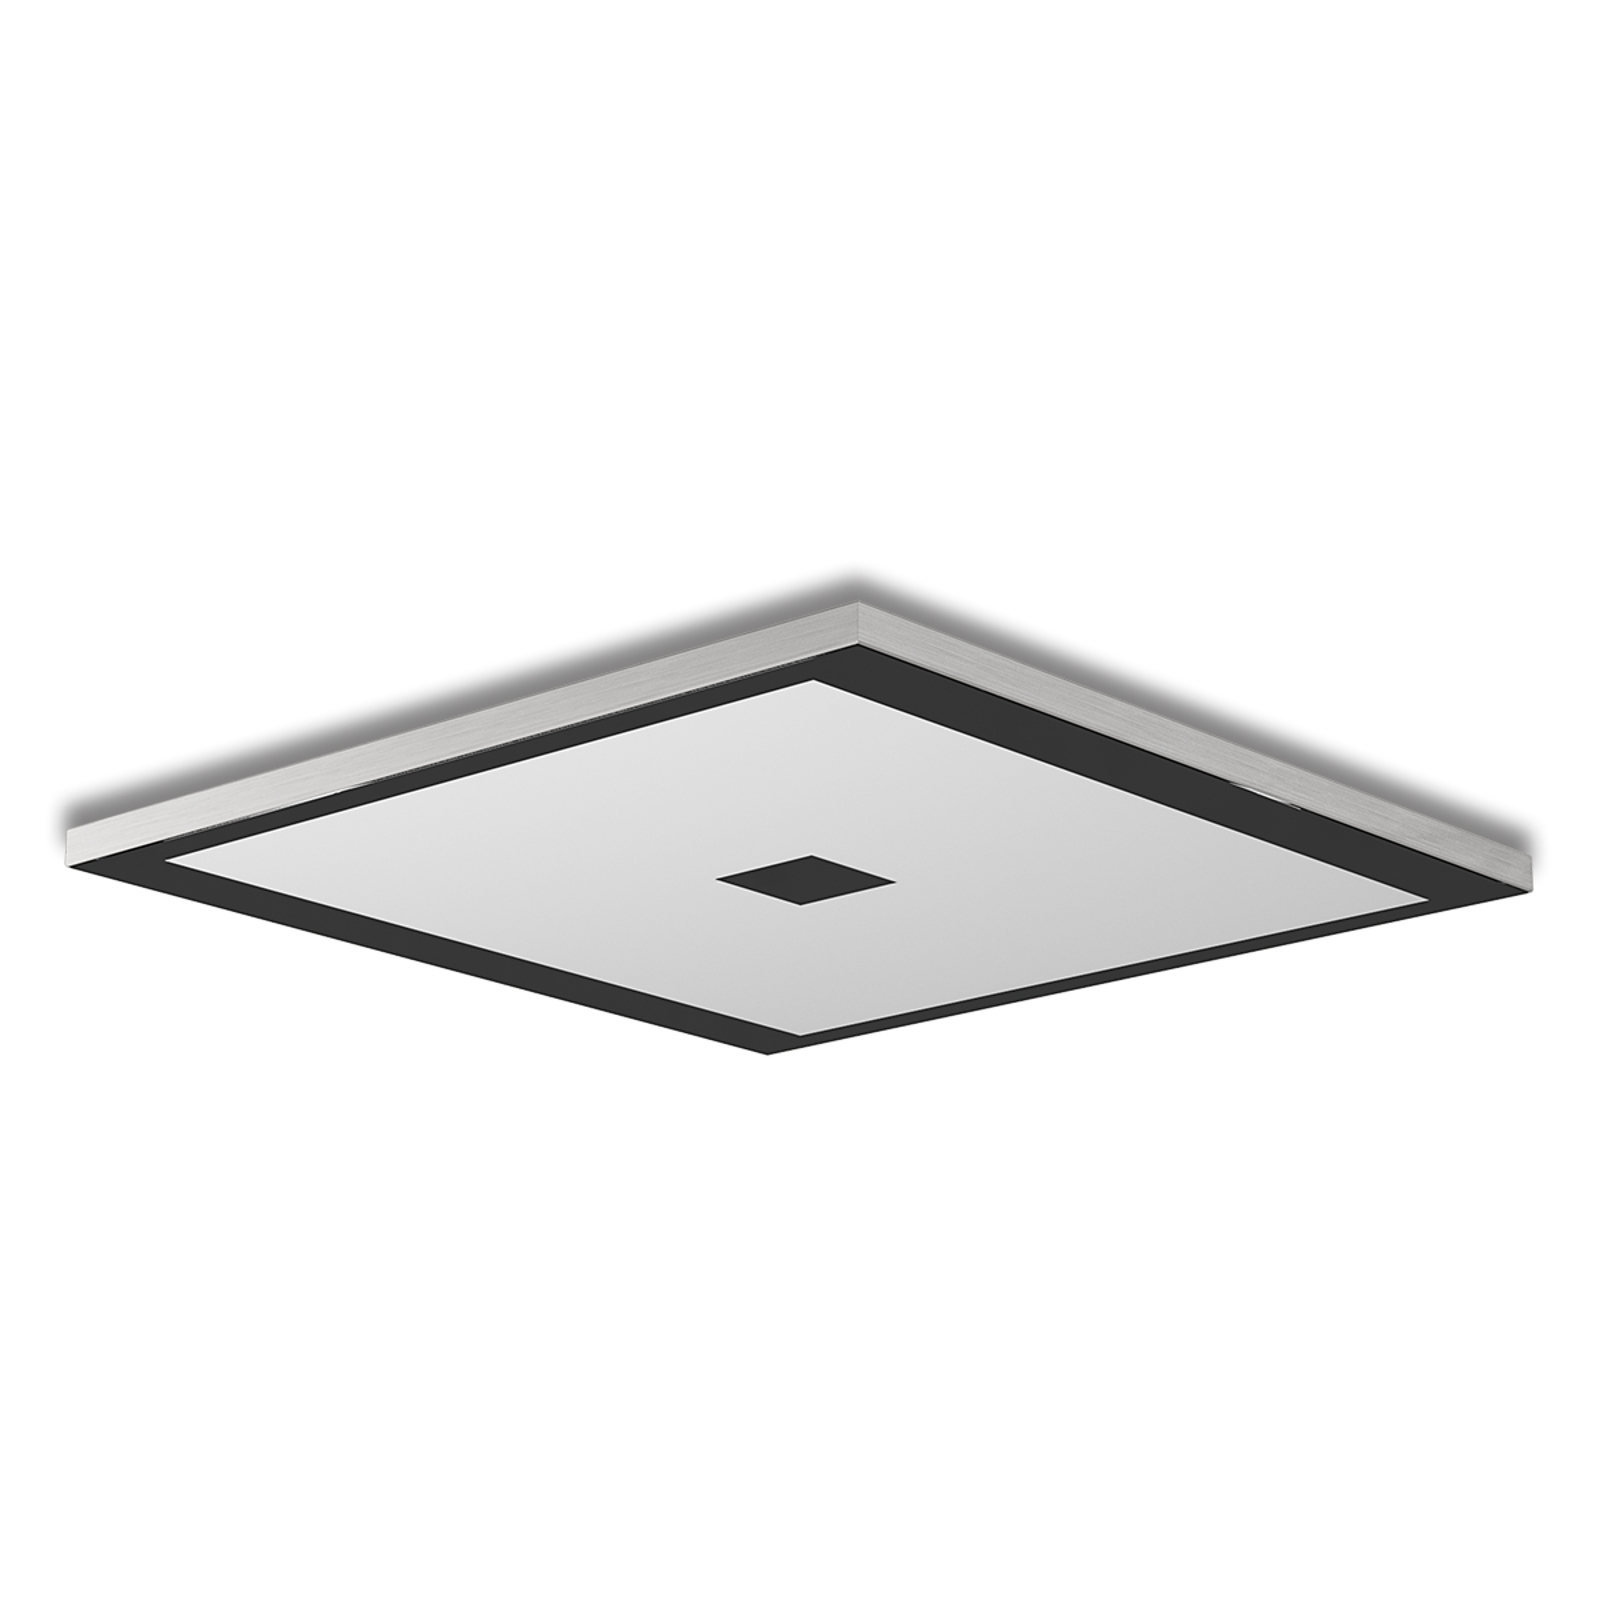 Quadratische LED-Deckenleuchte Zen - Color Control